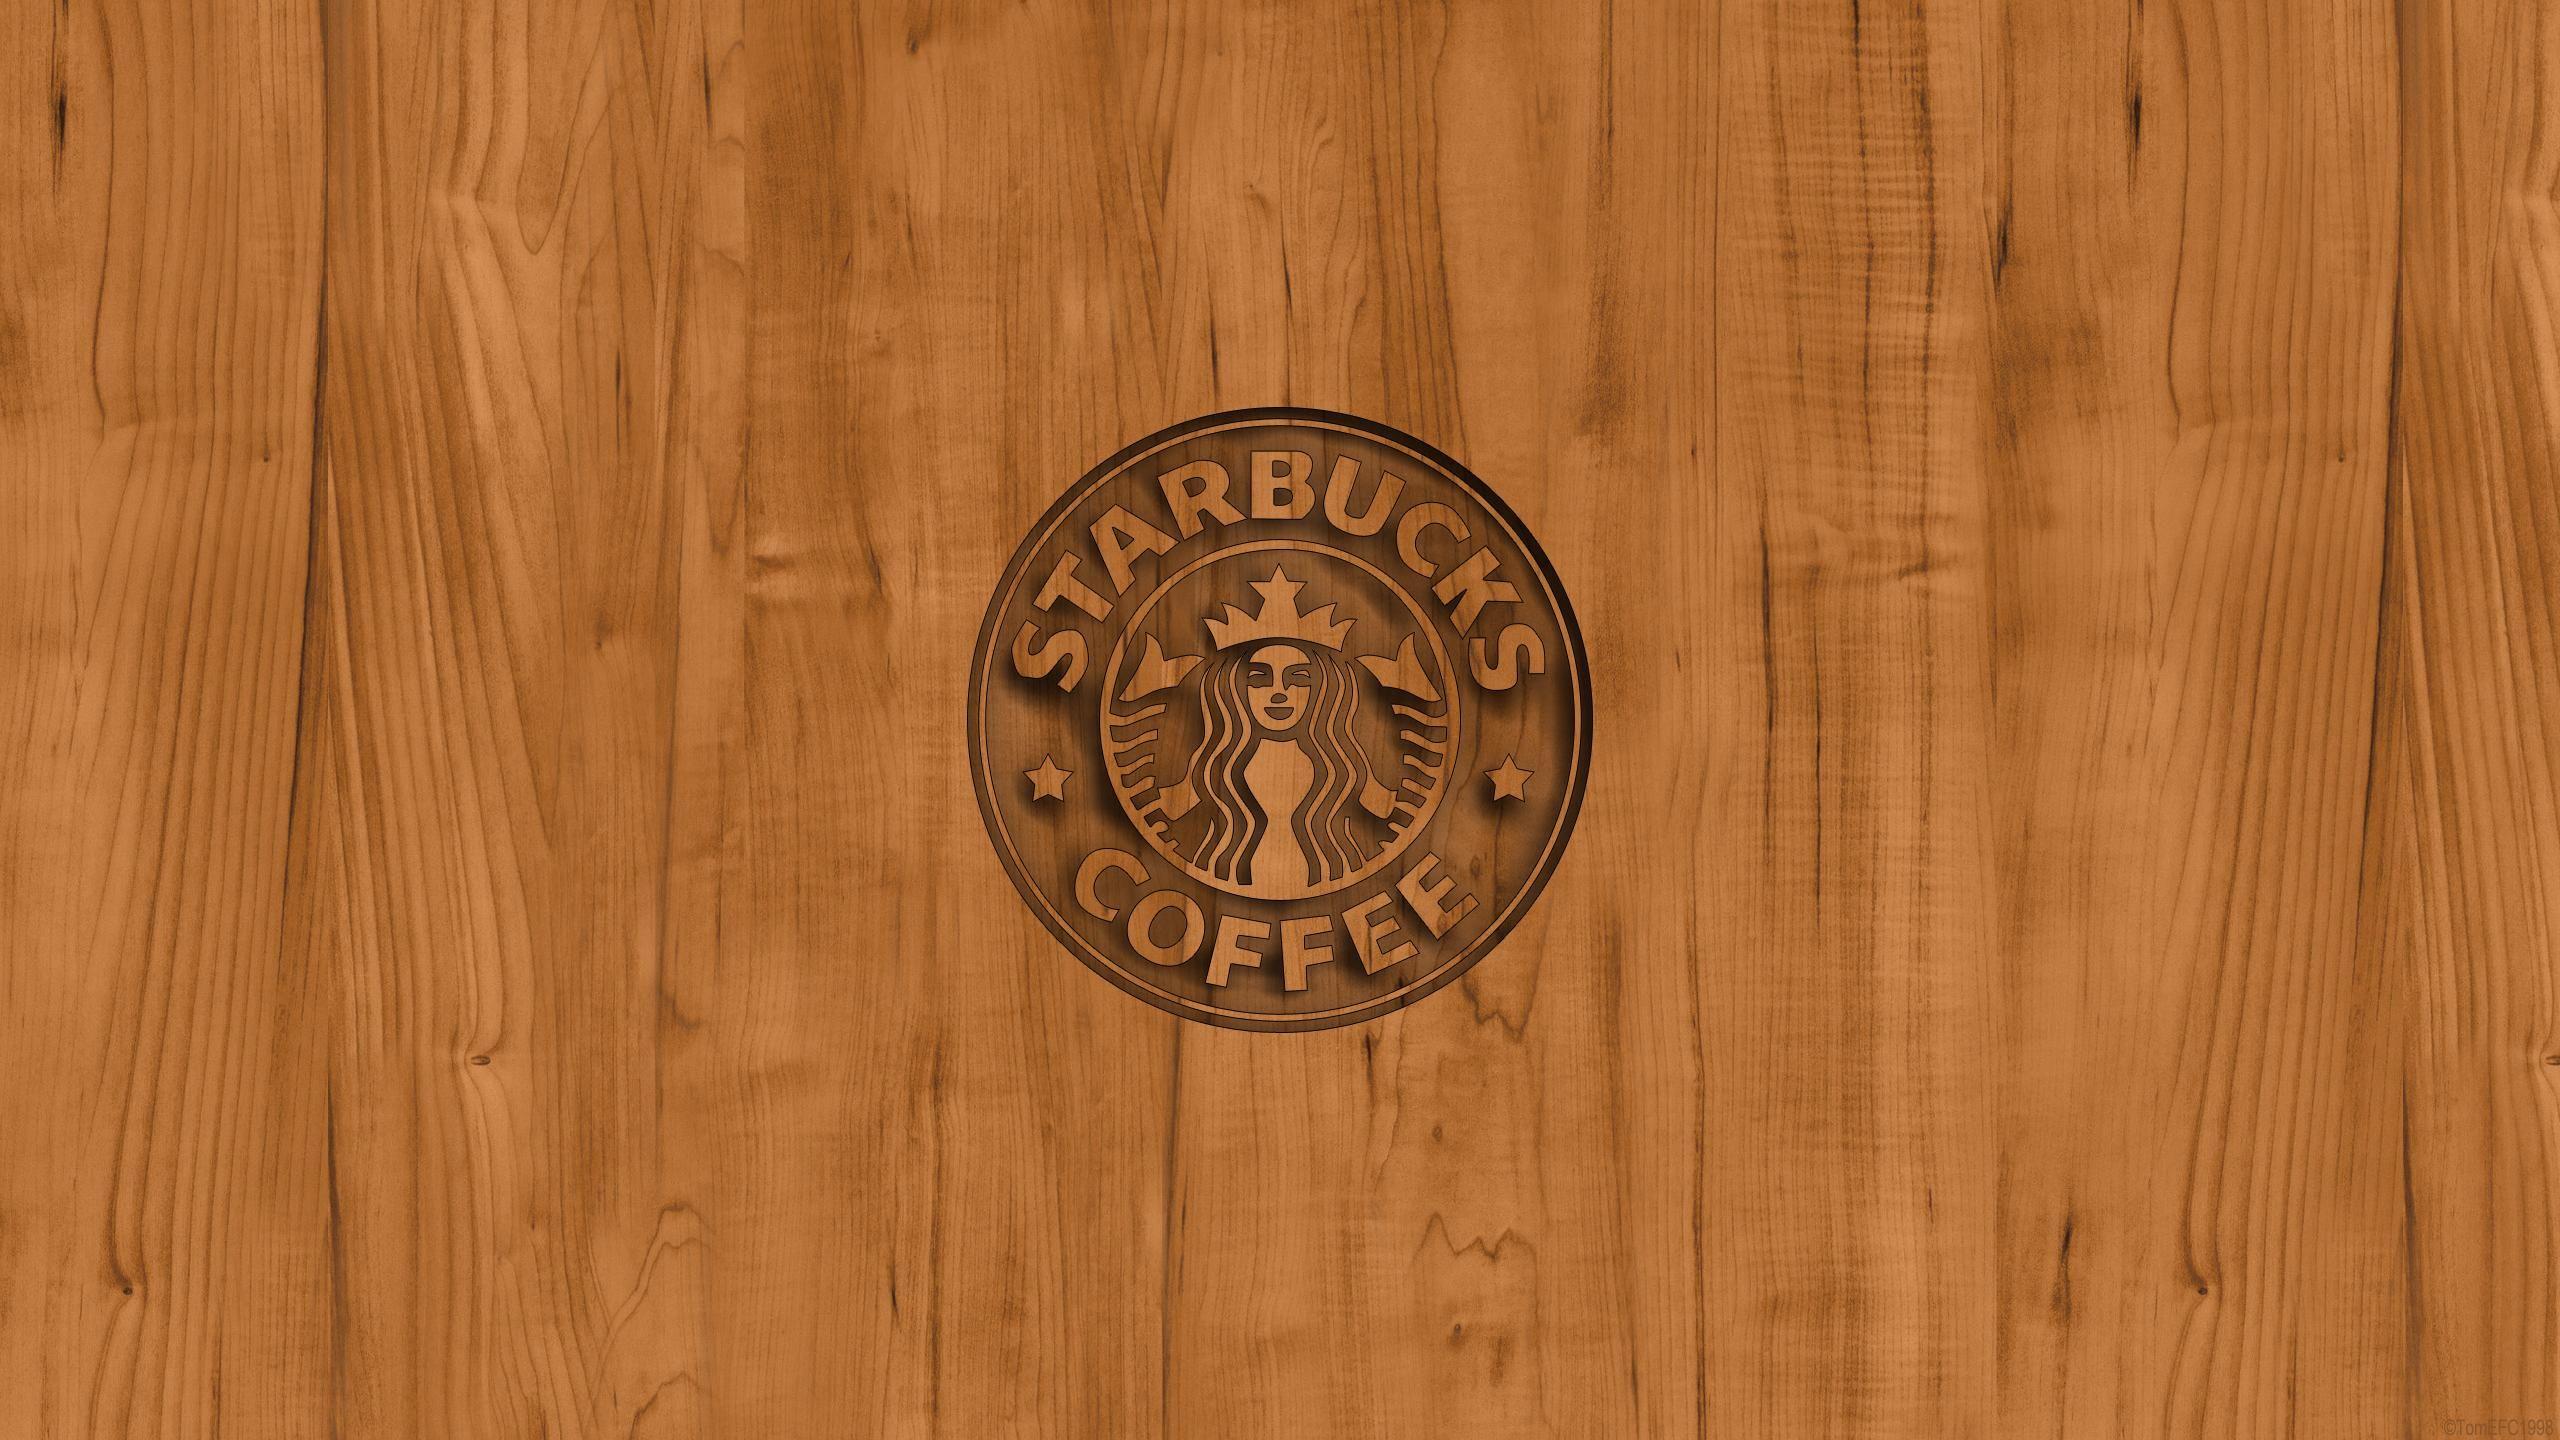 Starbucks Wallpapers Wallpaper Cave Images Wallpapers